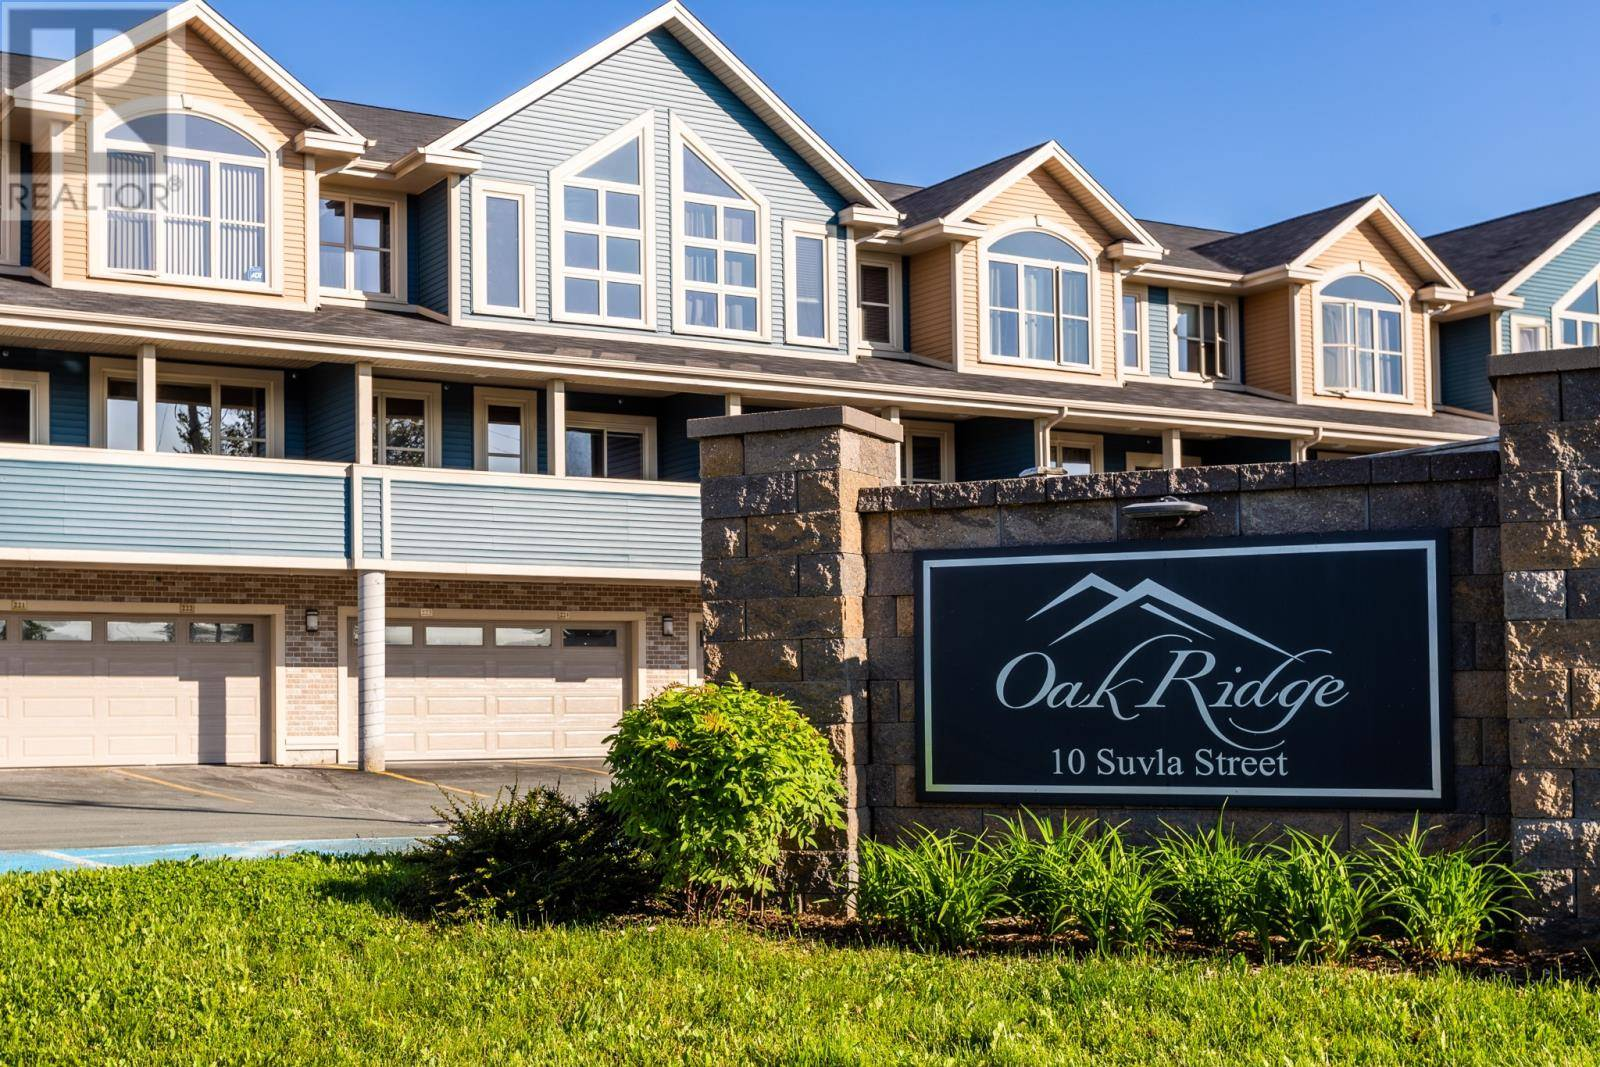 House for sale at 10 Suvla St Unit 210 St. John's Newfoundland - MLS: 1199468